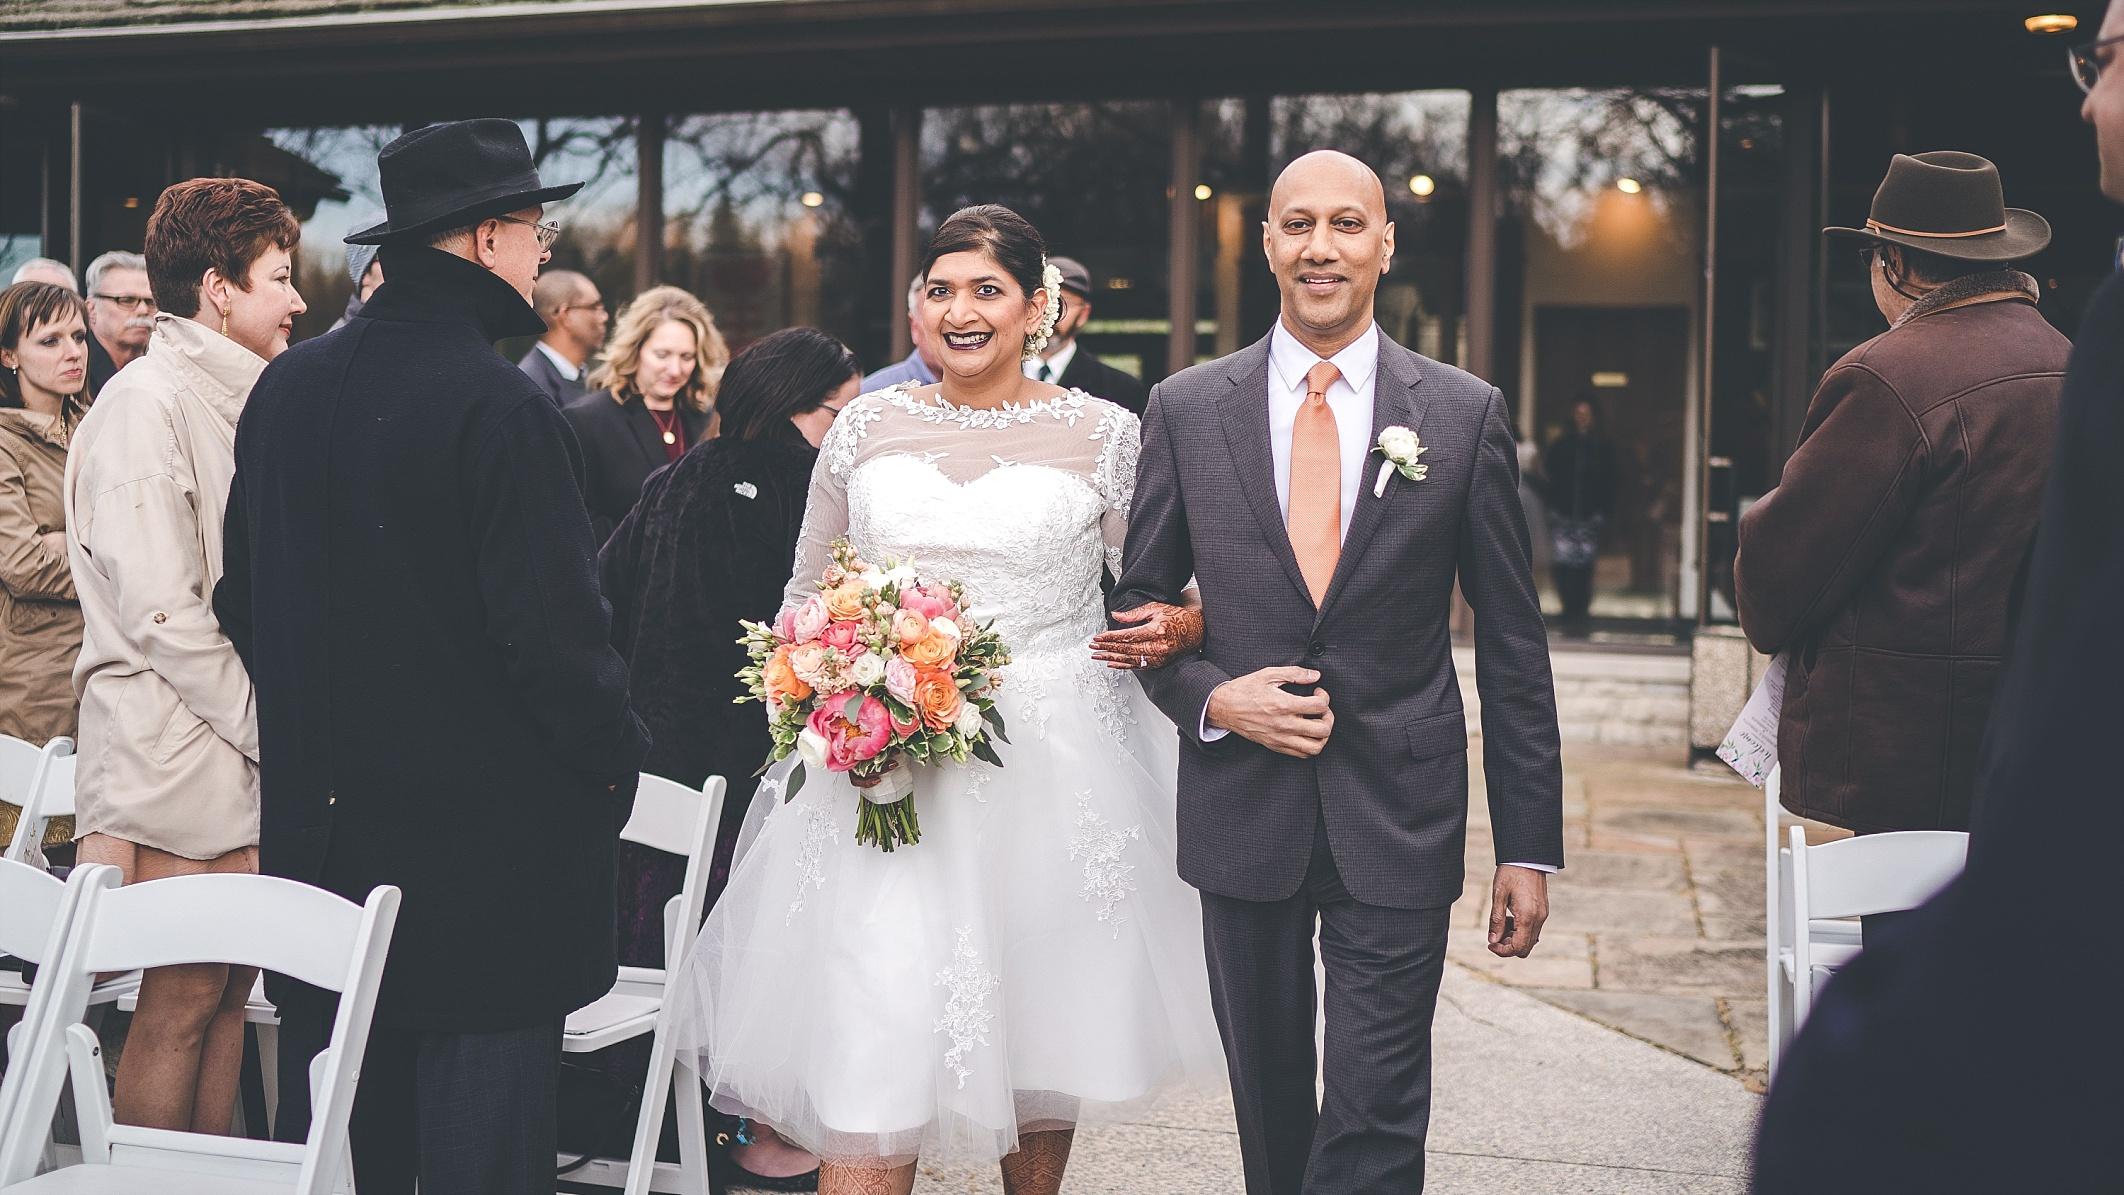 2706_dayton-indian-wedding-photographer-beavercreek_0061.jpg